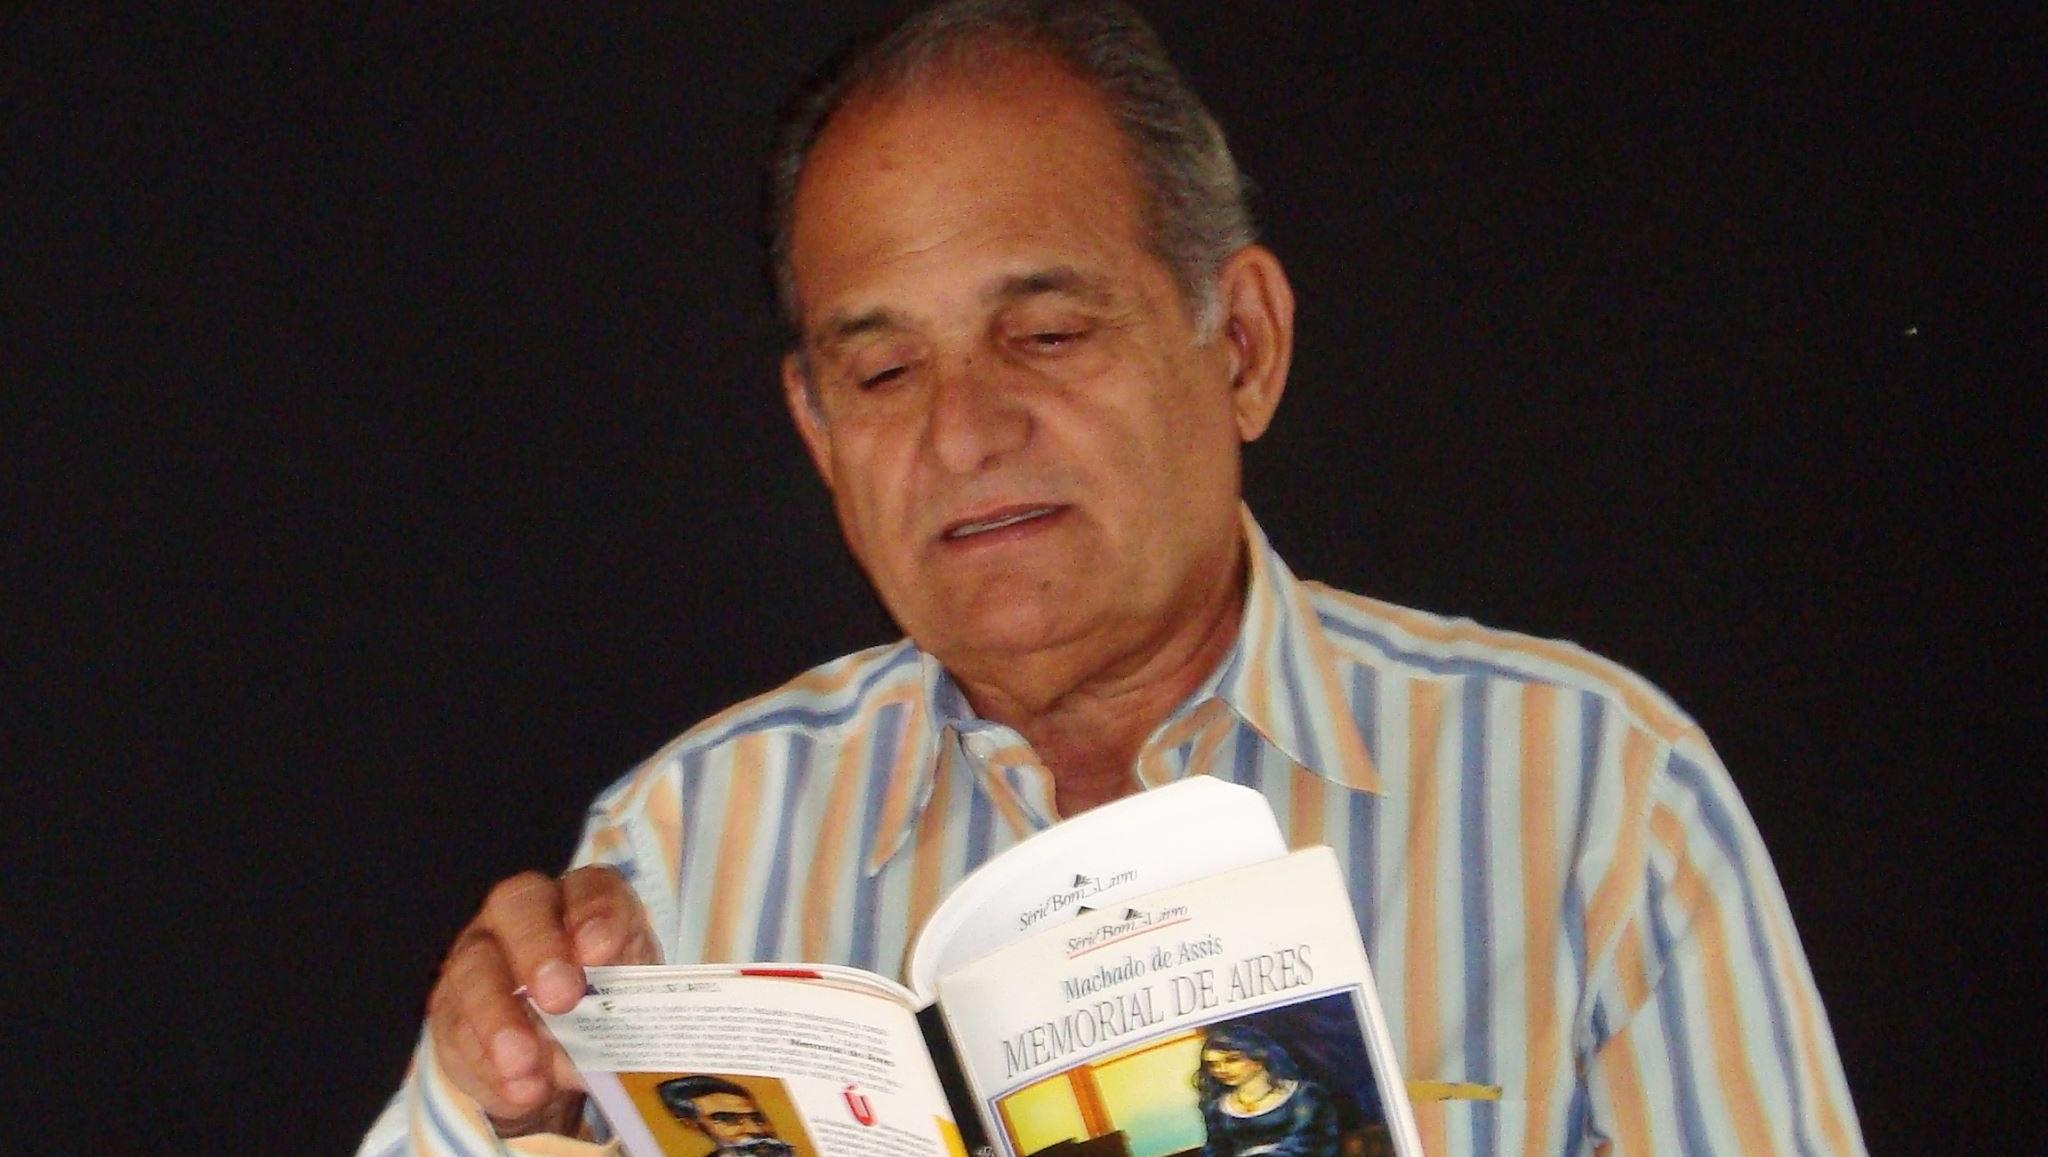 O niilismo humanista na poesia de Aidenor Aires